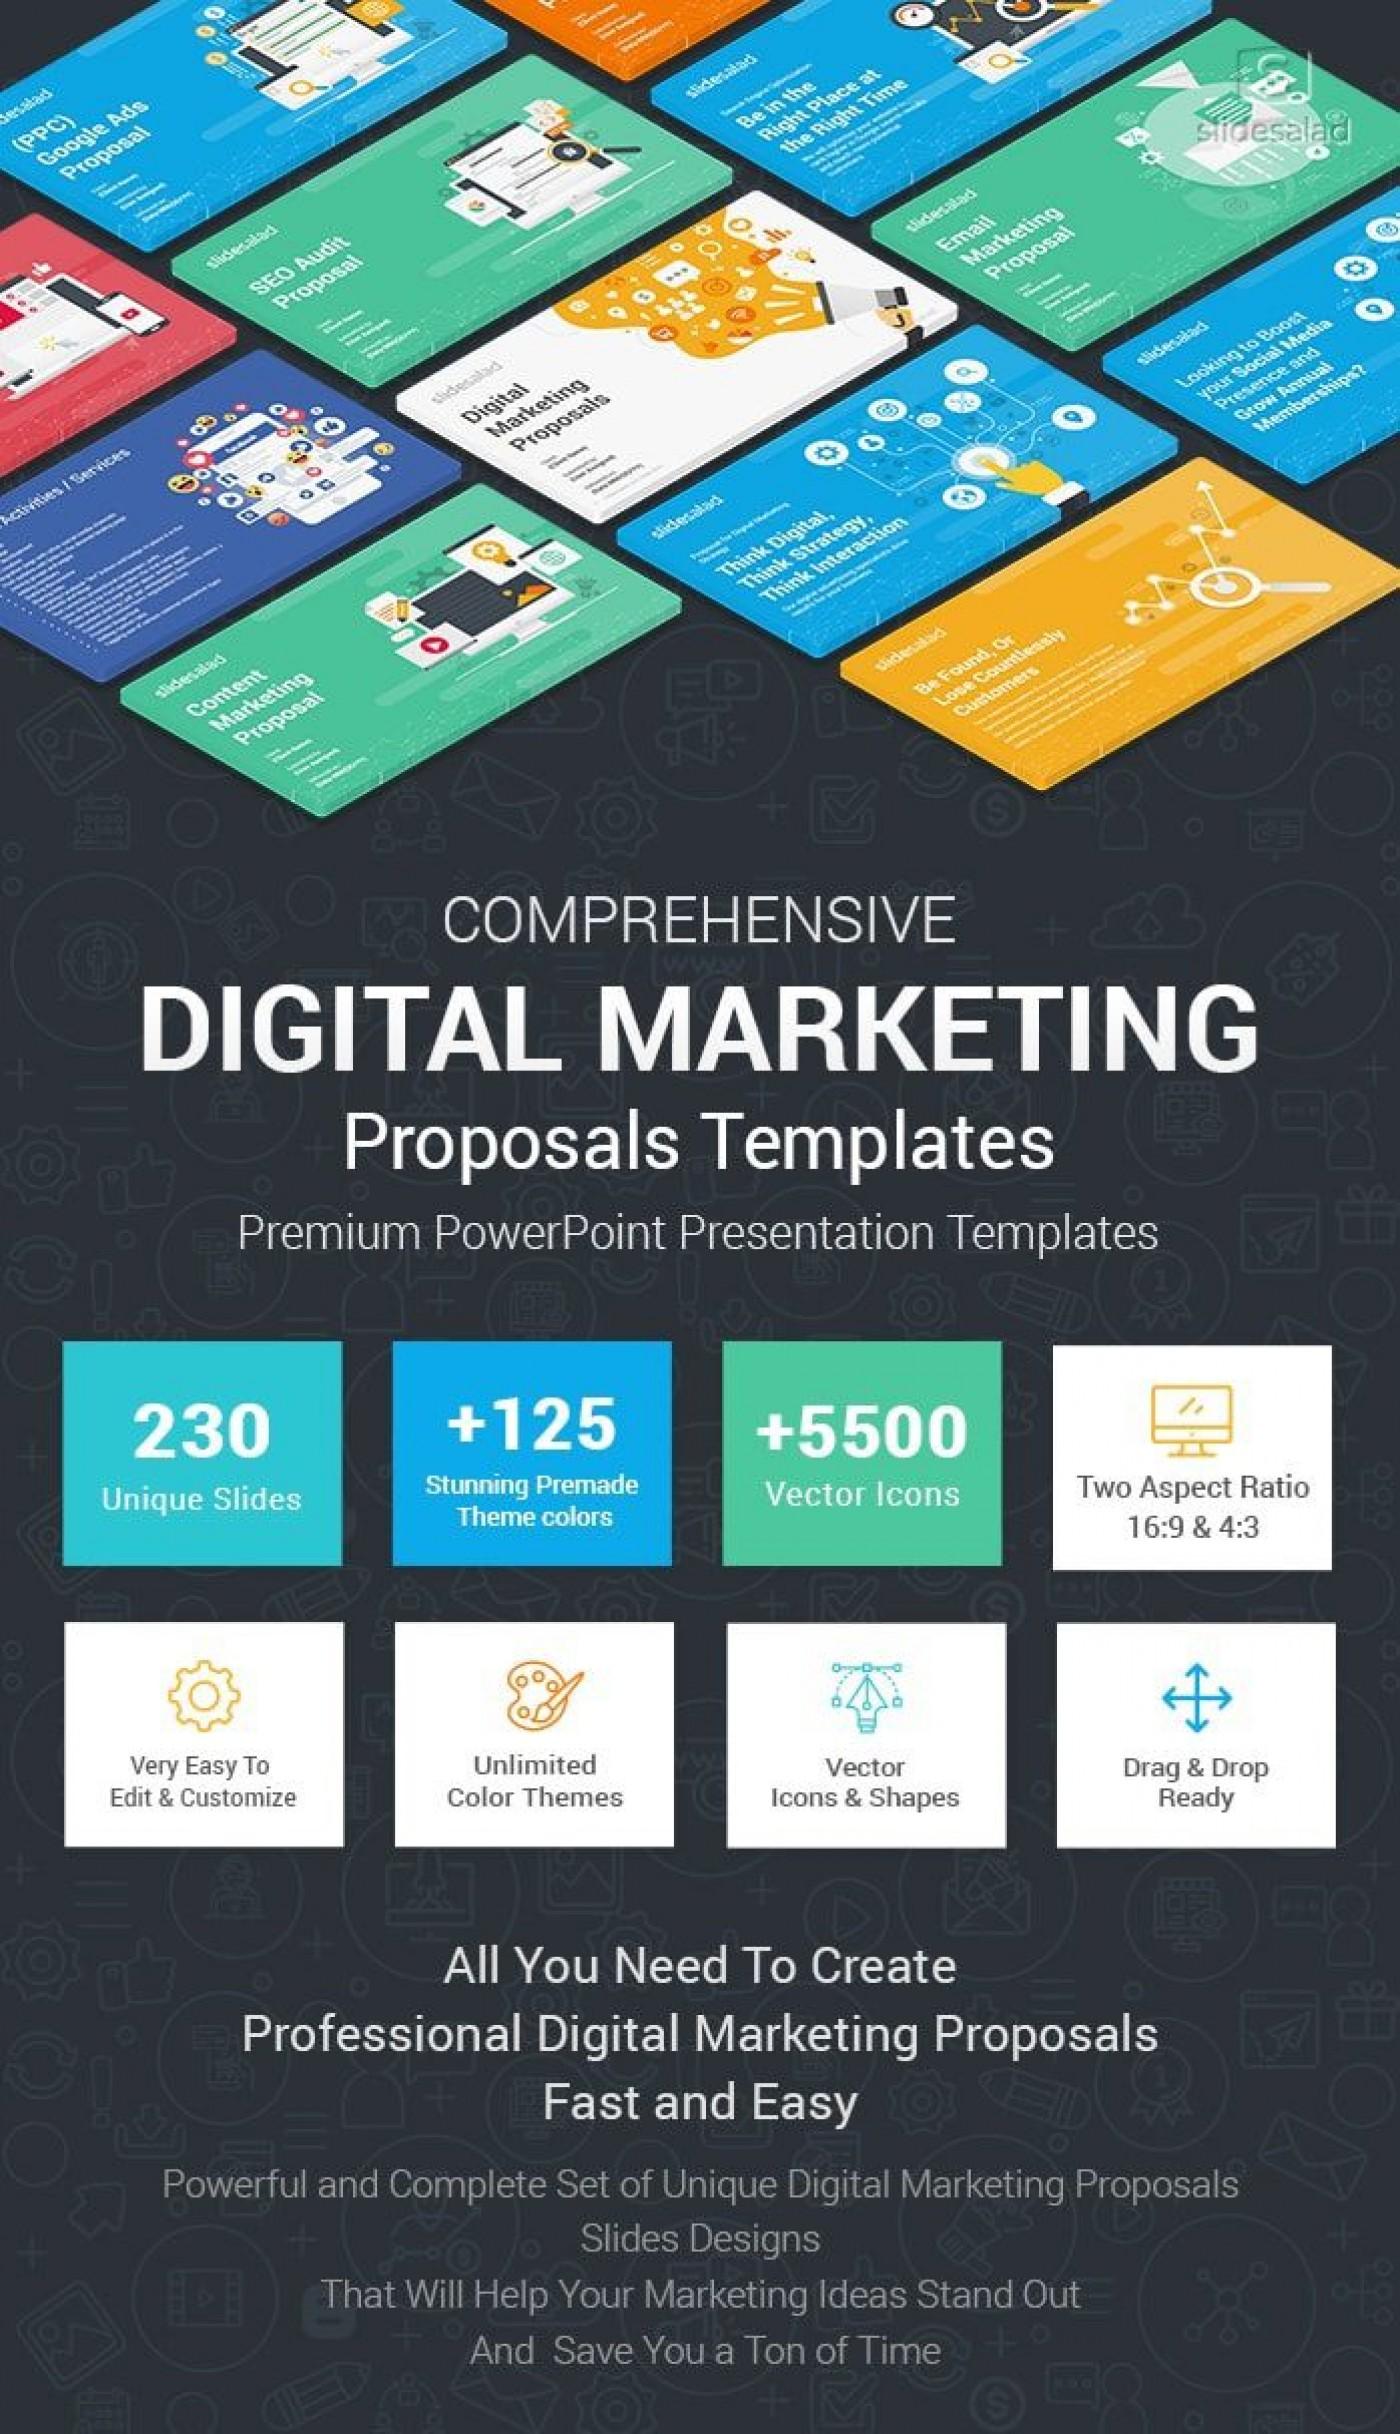 003 Breathtaking Social Media Proposal Template Ppt Inspiration 1400